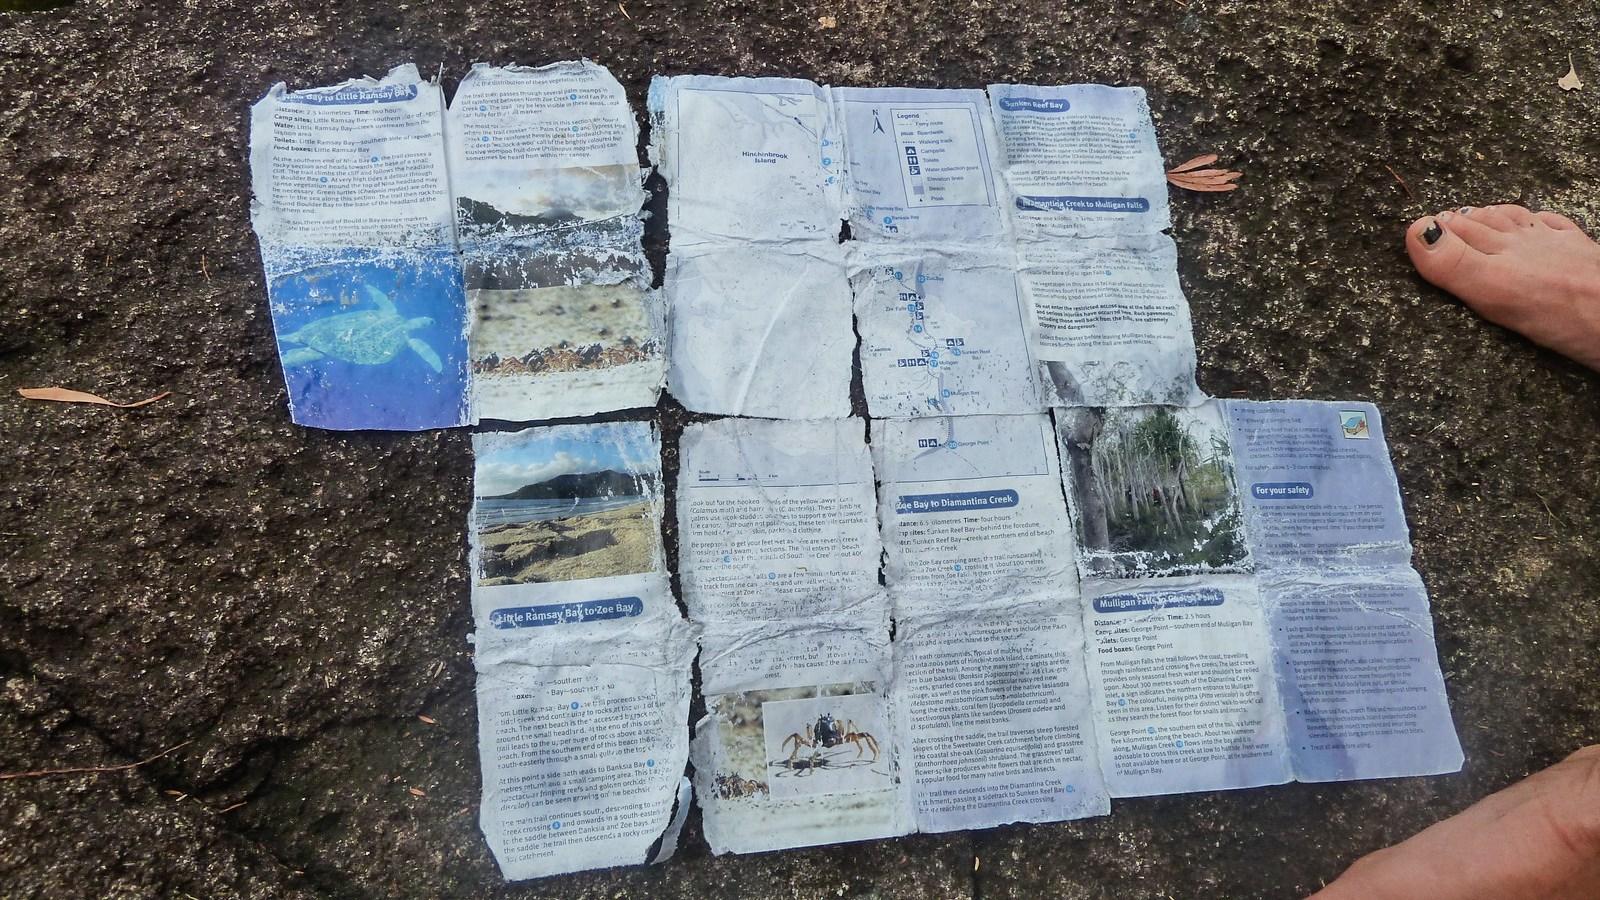 a photo of a torn hinchinbrook island hiking map